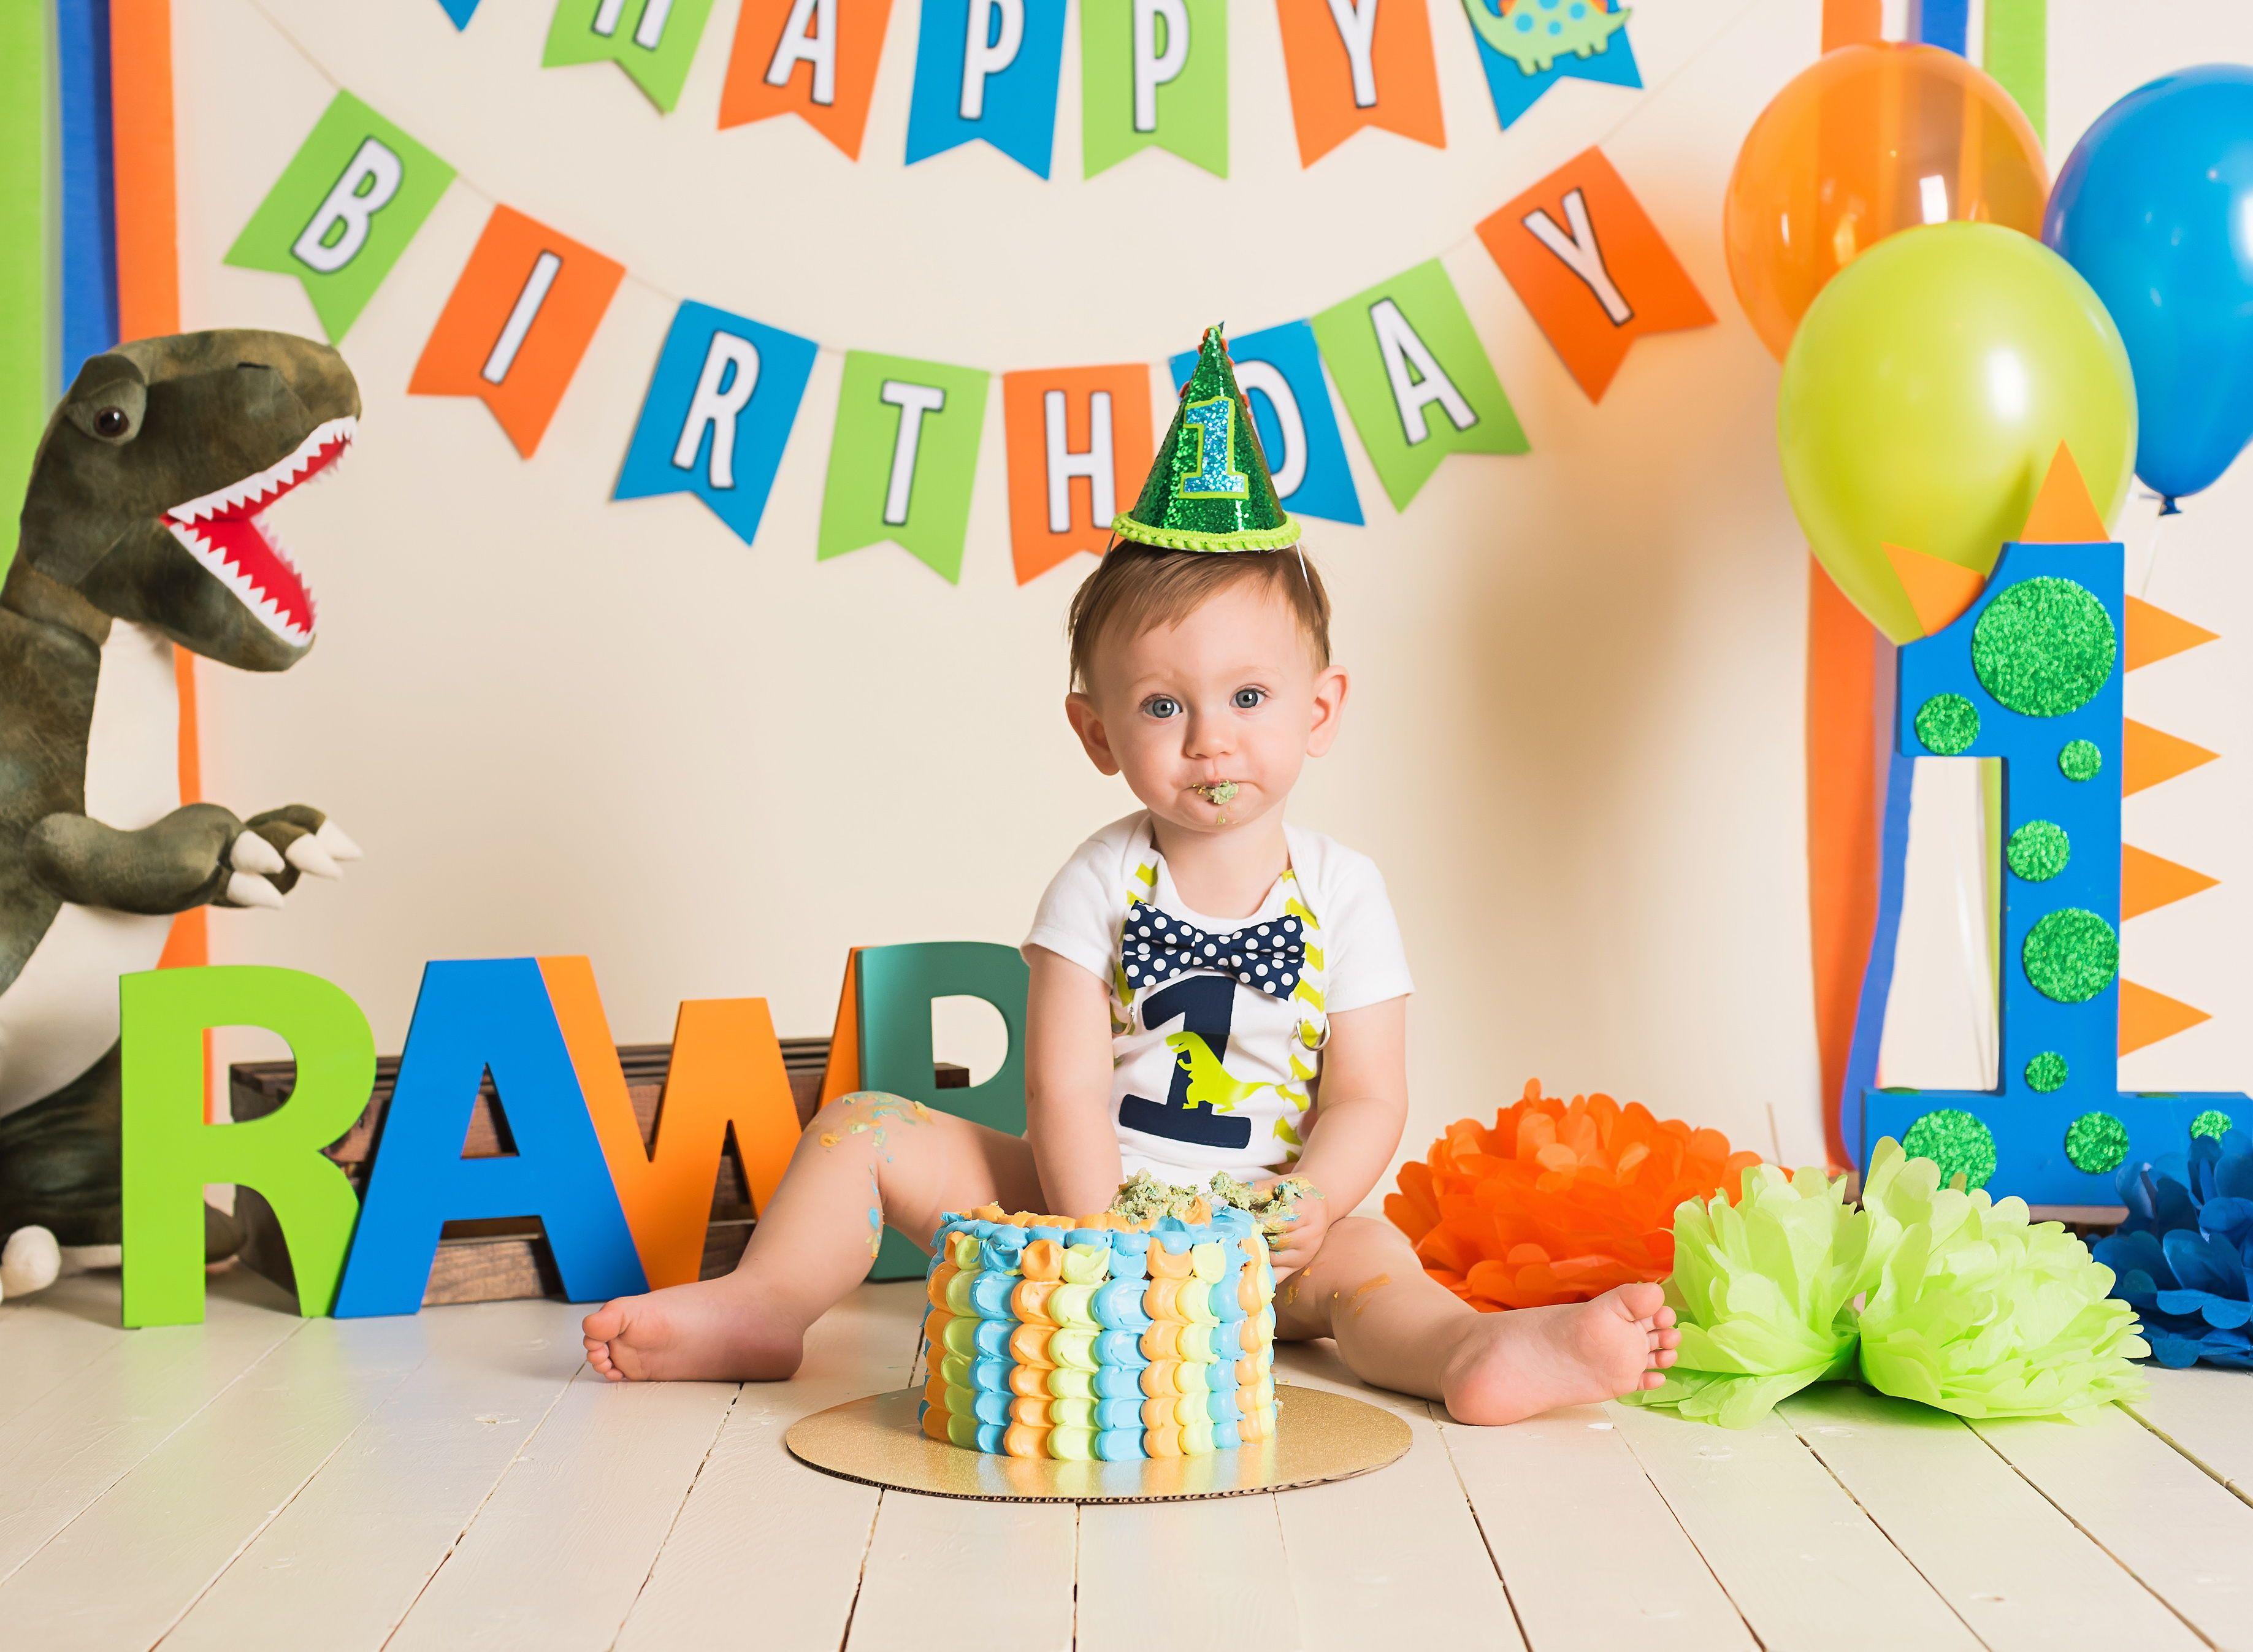 innovative ideas for birthday celebration